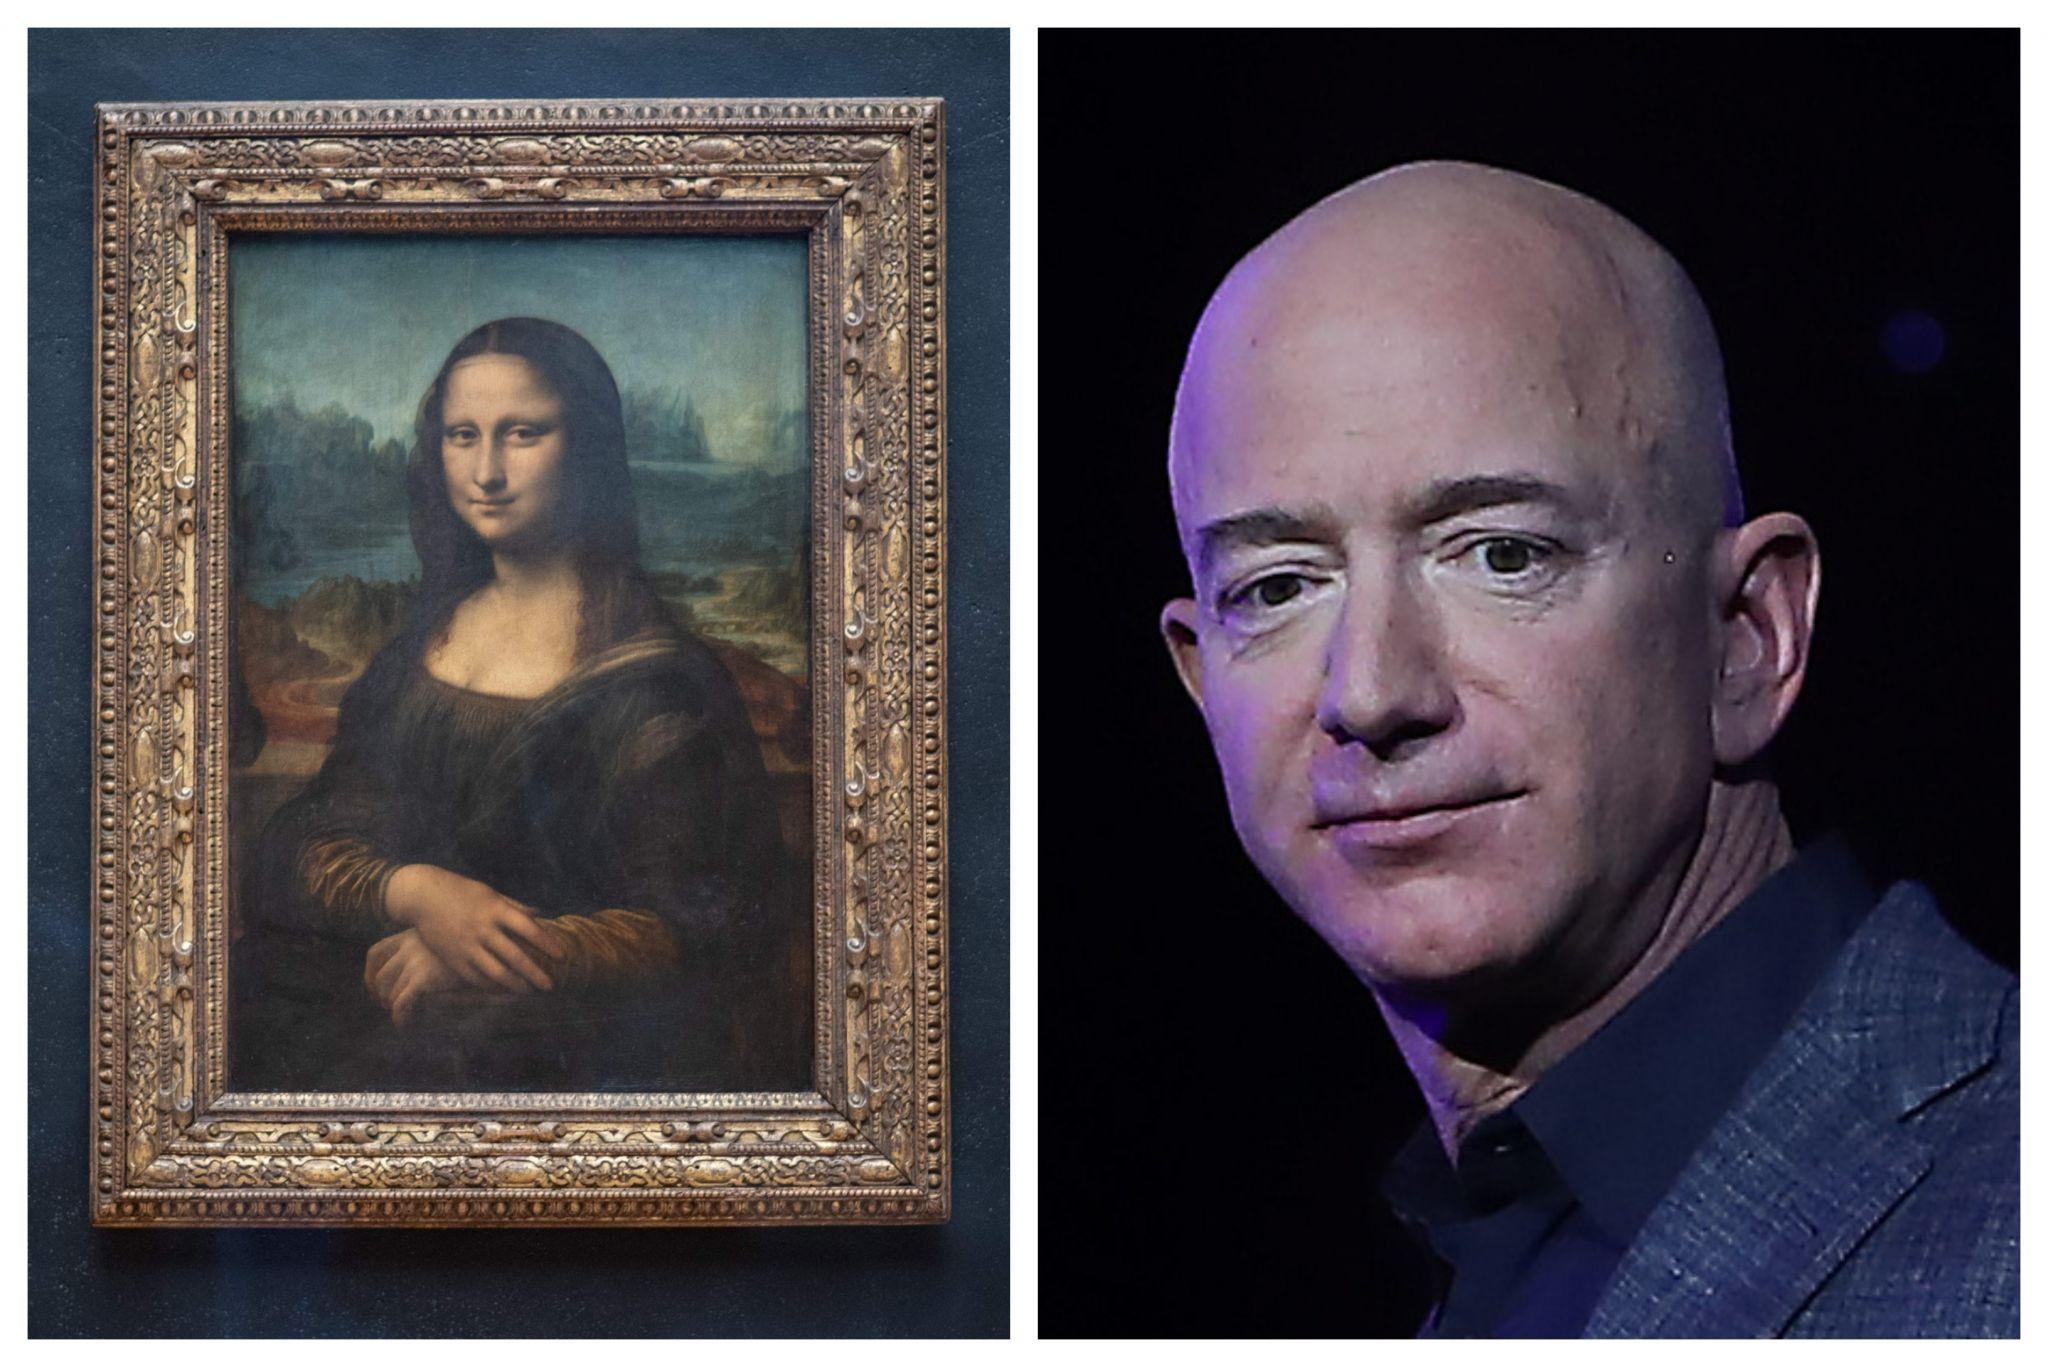 The Internet wants Jeff Bezos to buy and eat the Mona Lisa